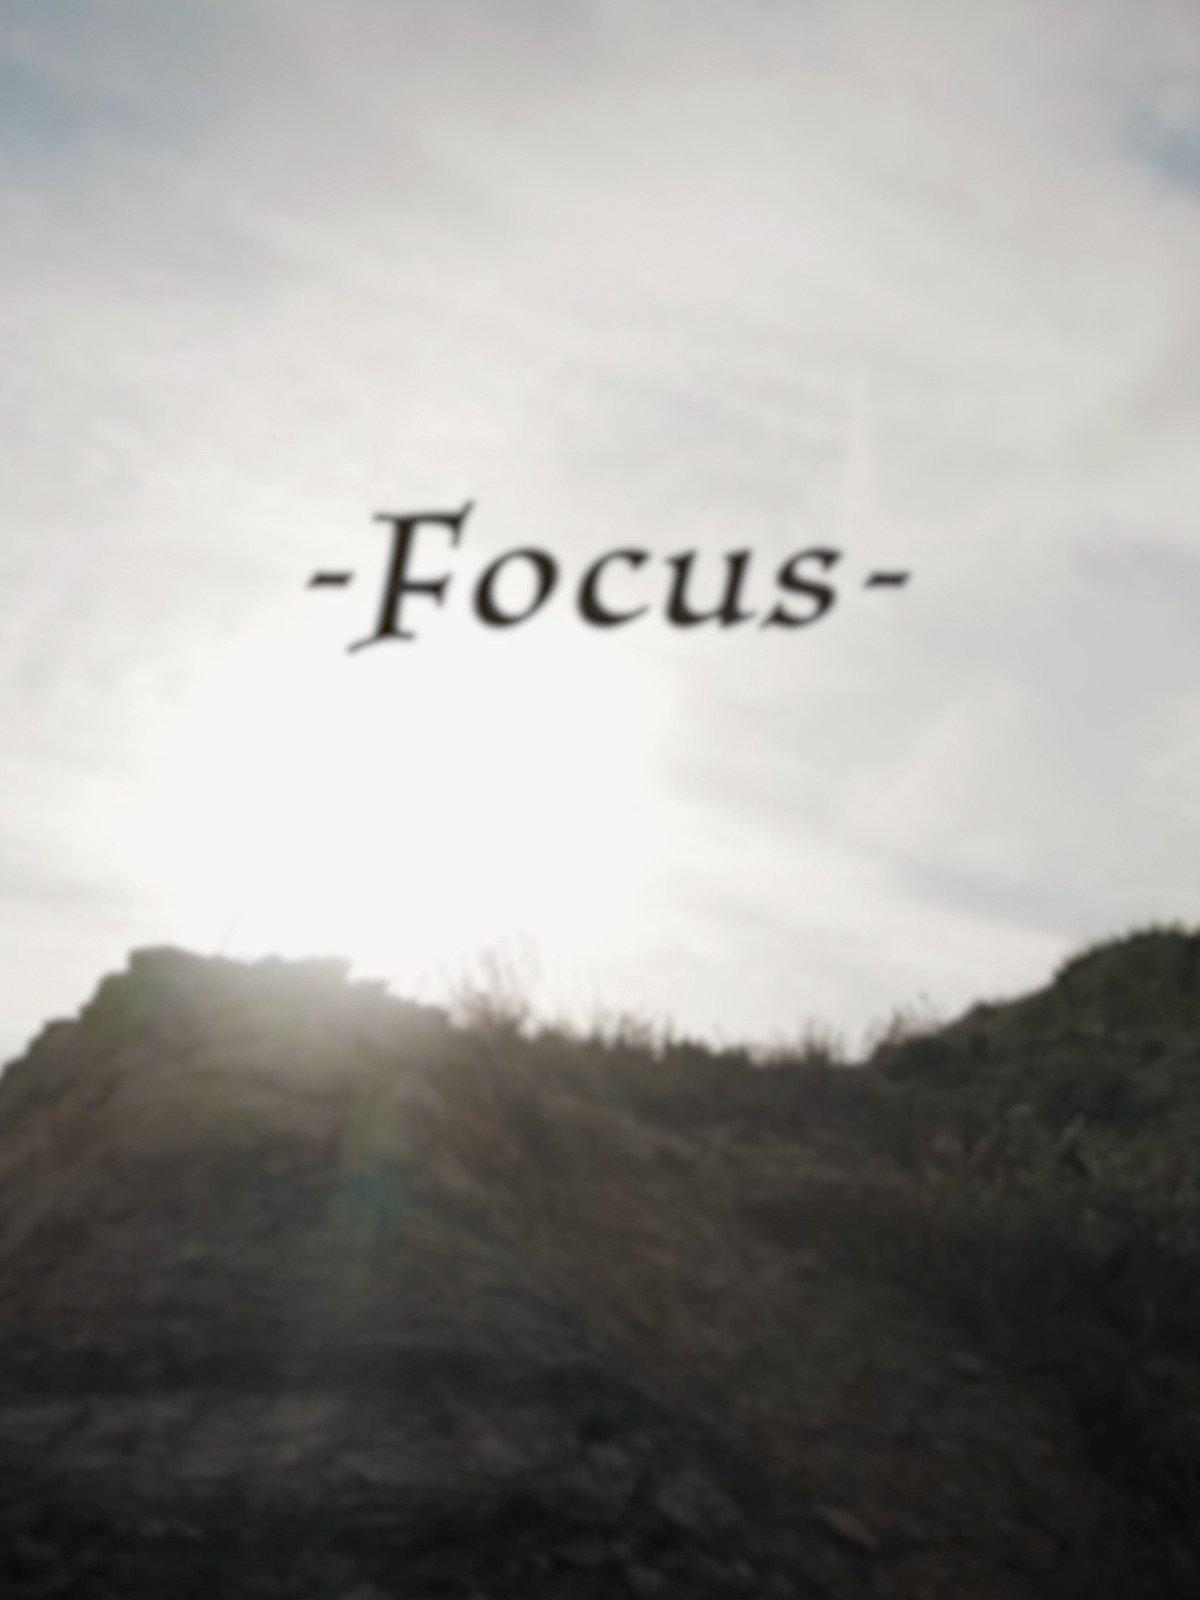 Focus on Amazon Prime Instant Video UK